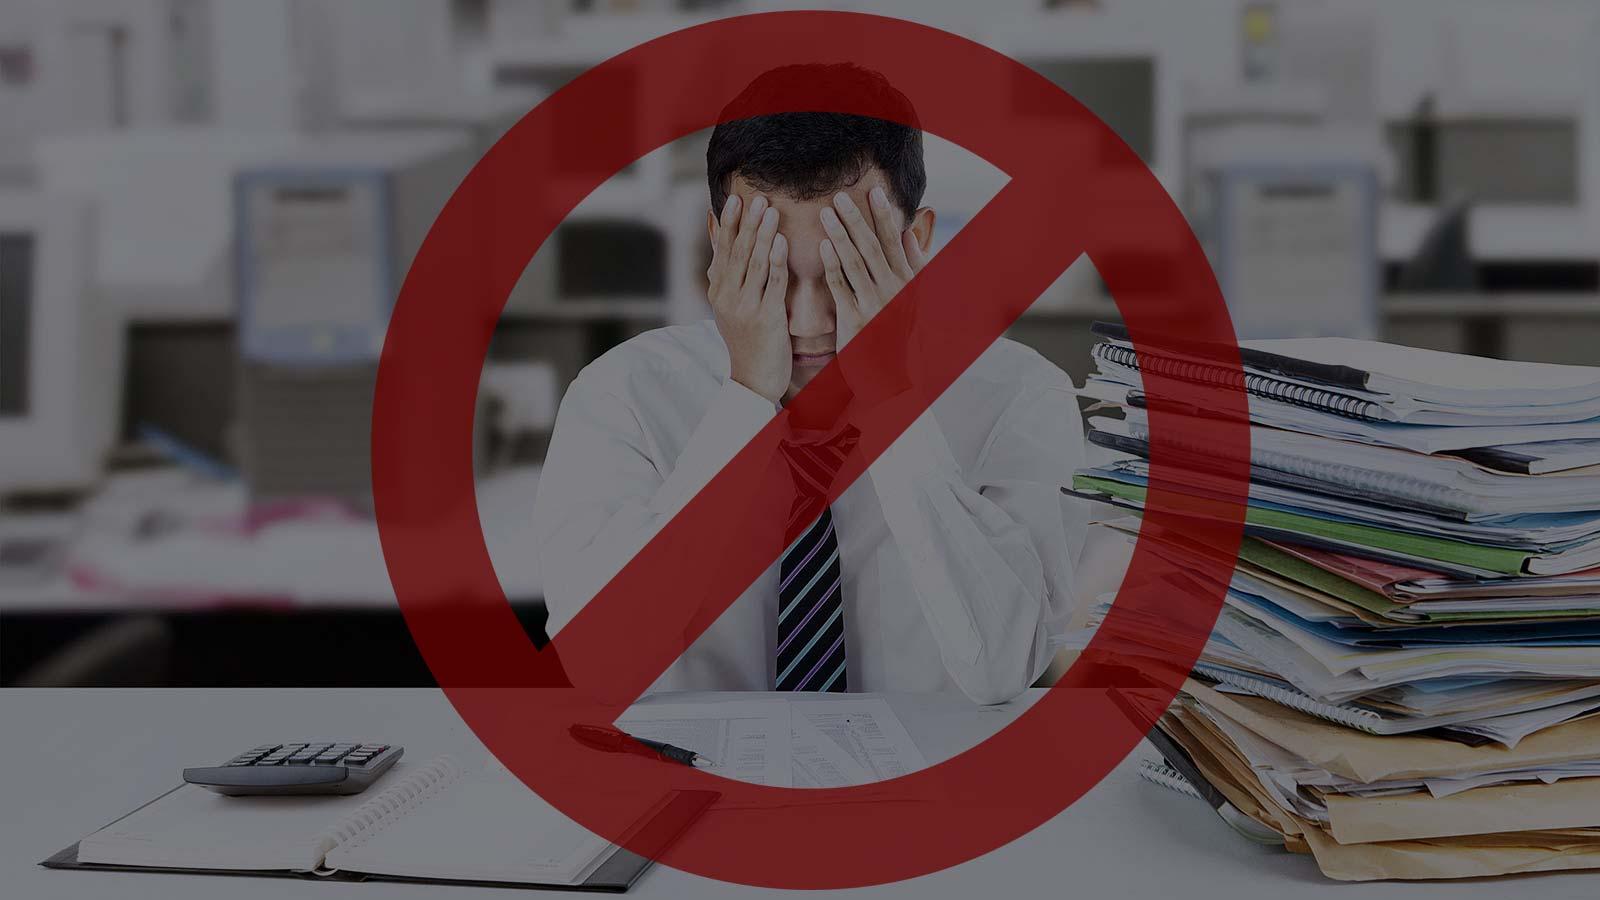 ممنوعیت ثبت شرکت کارمندان دولت